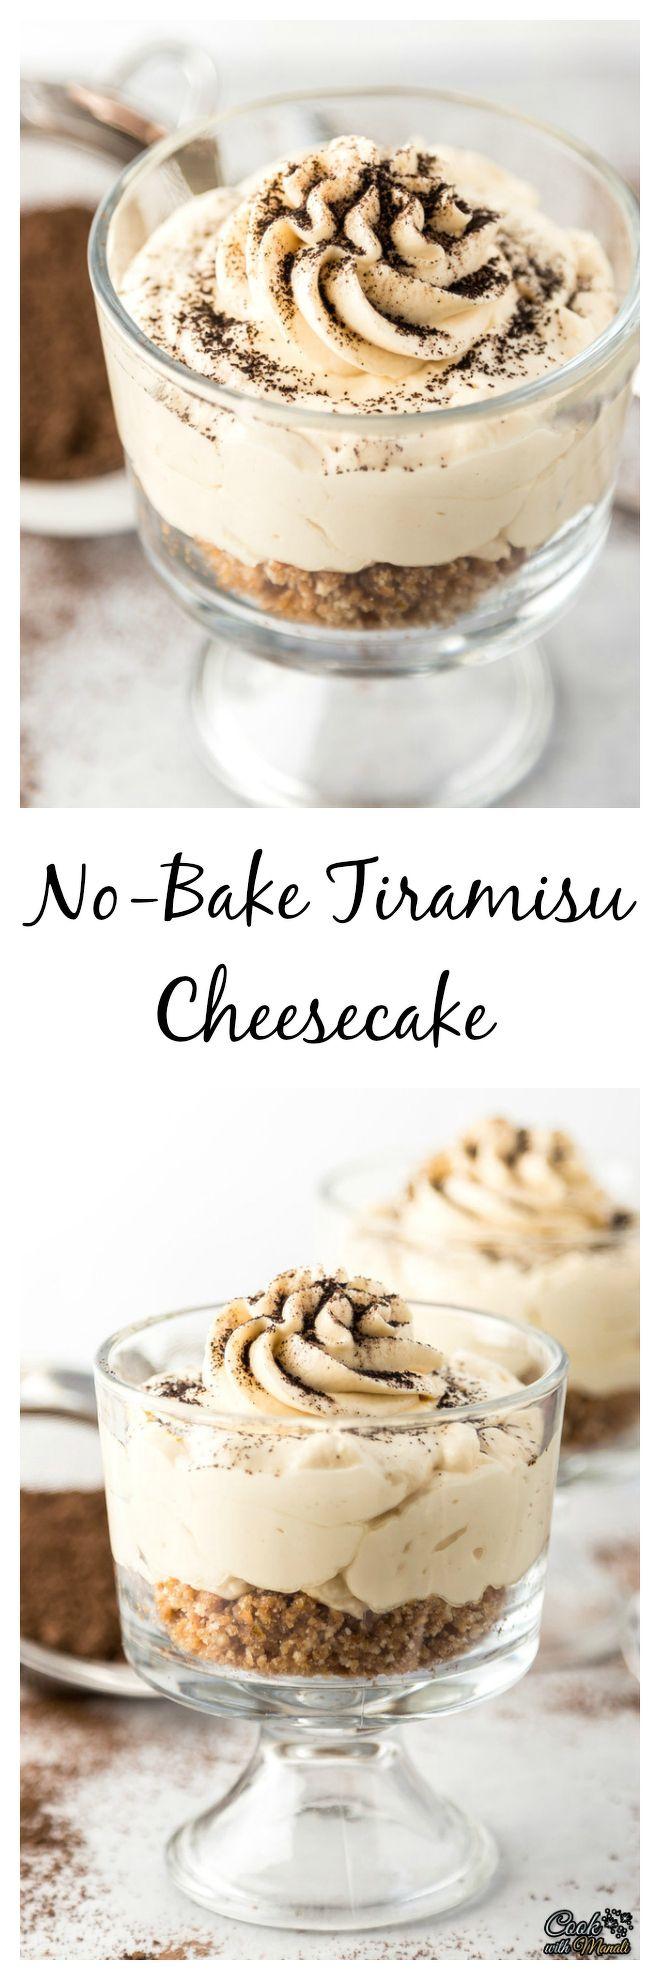 Individual No Bake Tiramisu Cheesecake is an easy way to satisfy your Tiramisu craving! #cheesecake #nobake #dessert